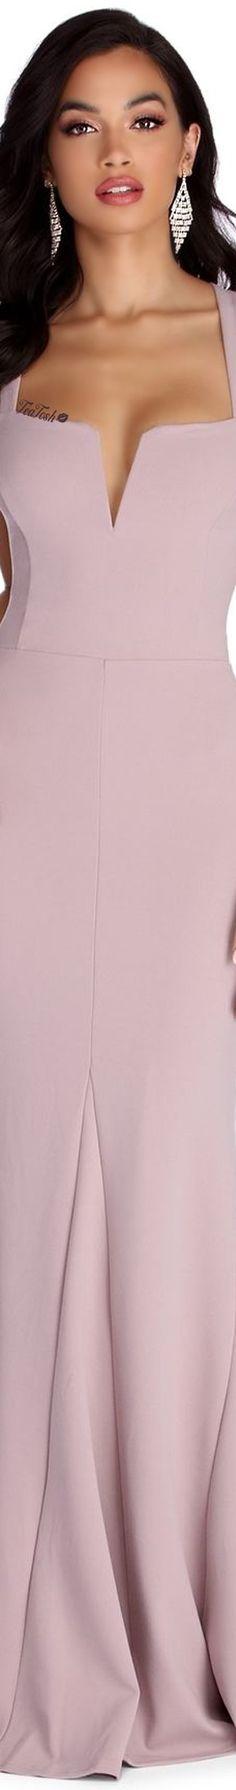 ❈Téa Tosh❈ #RonaMahal for #windsorstore #teatosh Love And Light, Peace And Love, Windsor Store, Light Pink Rose, Perfect Pink, Fashion Lighting, Mauve, Feminine, Glamour